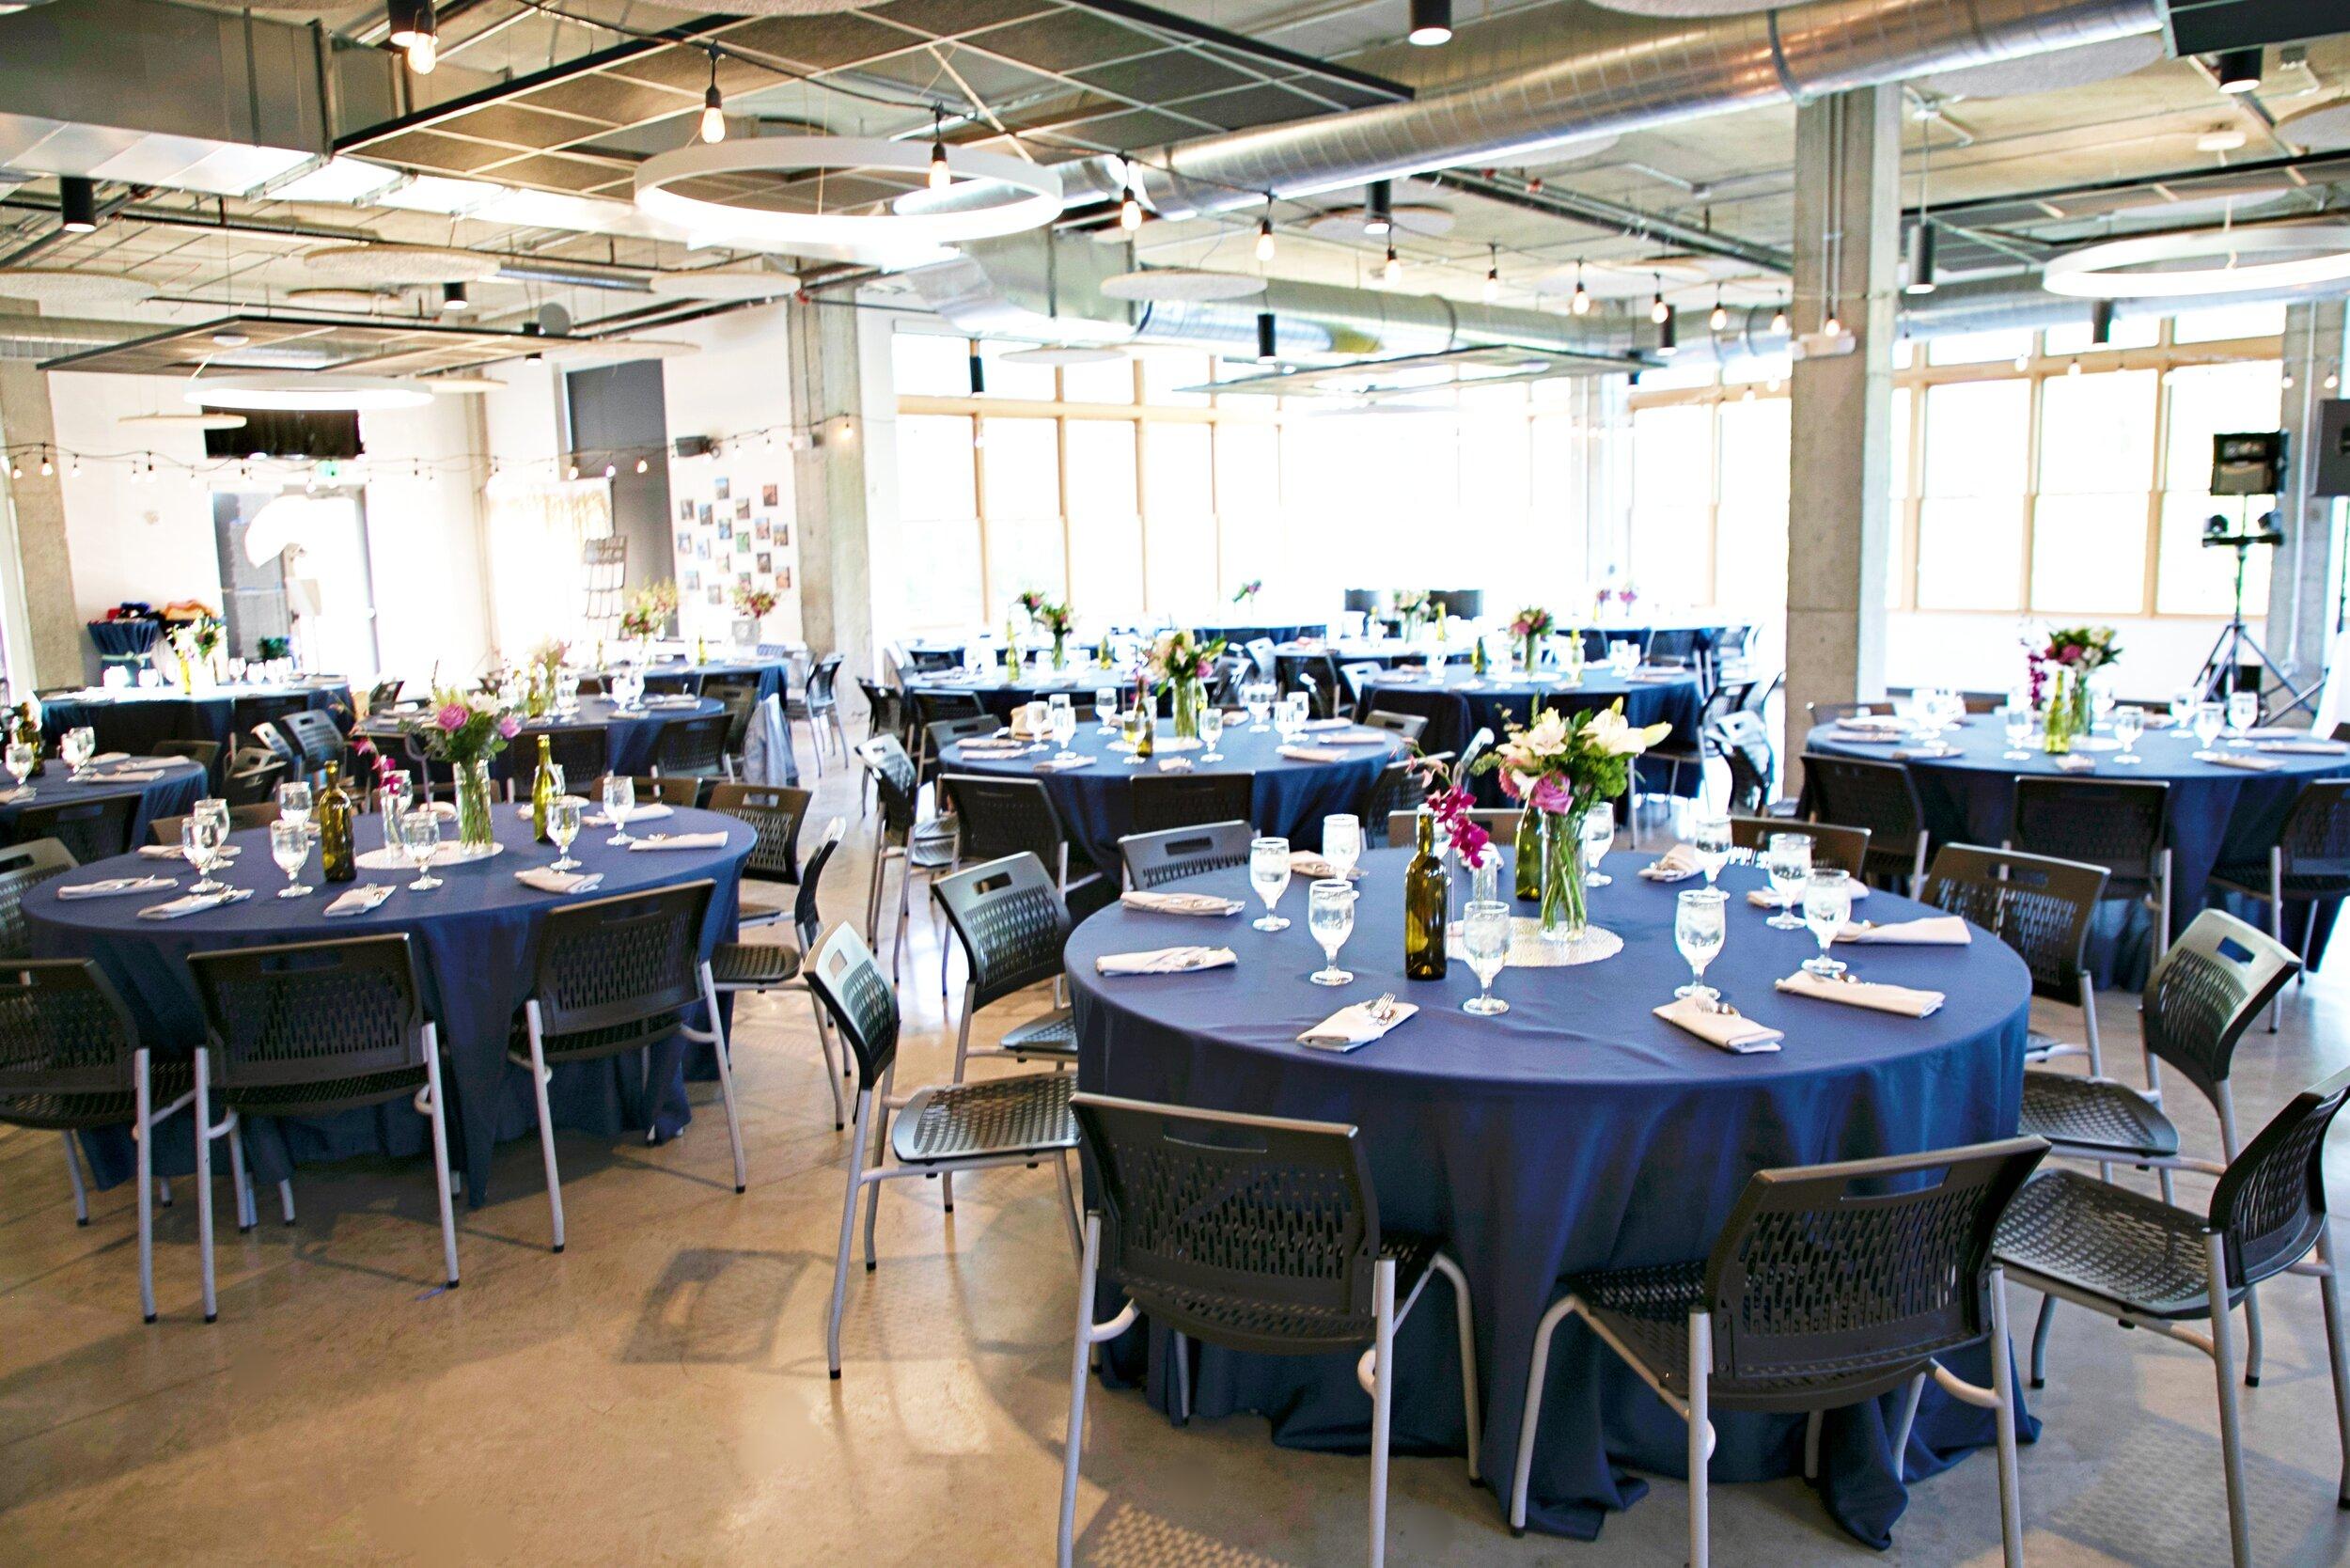 Block_One_Events_Venue_Wedding_Indoor_Modern_Old_Town.jpg